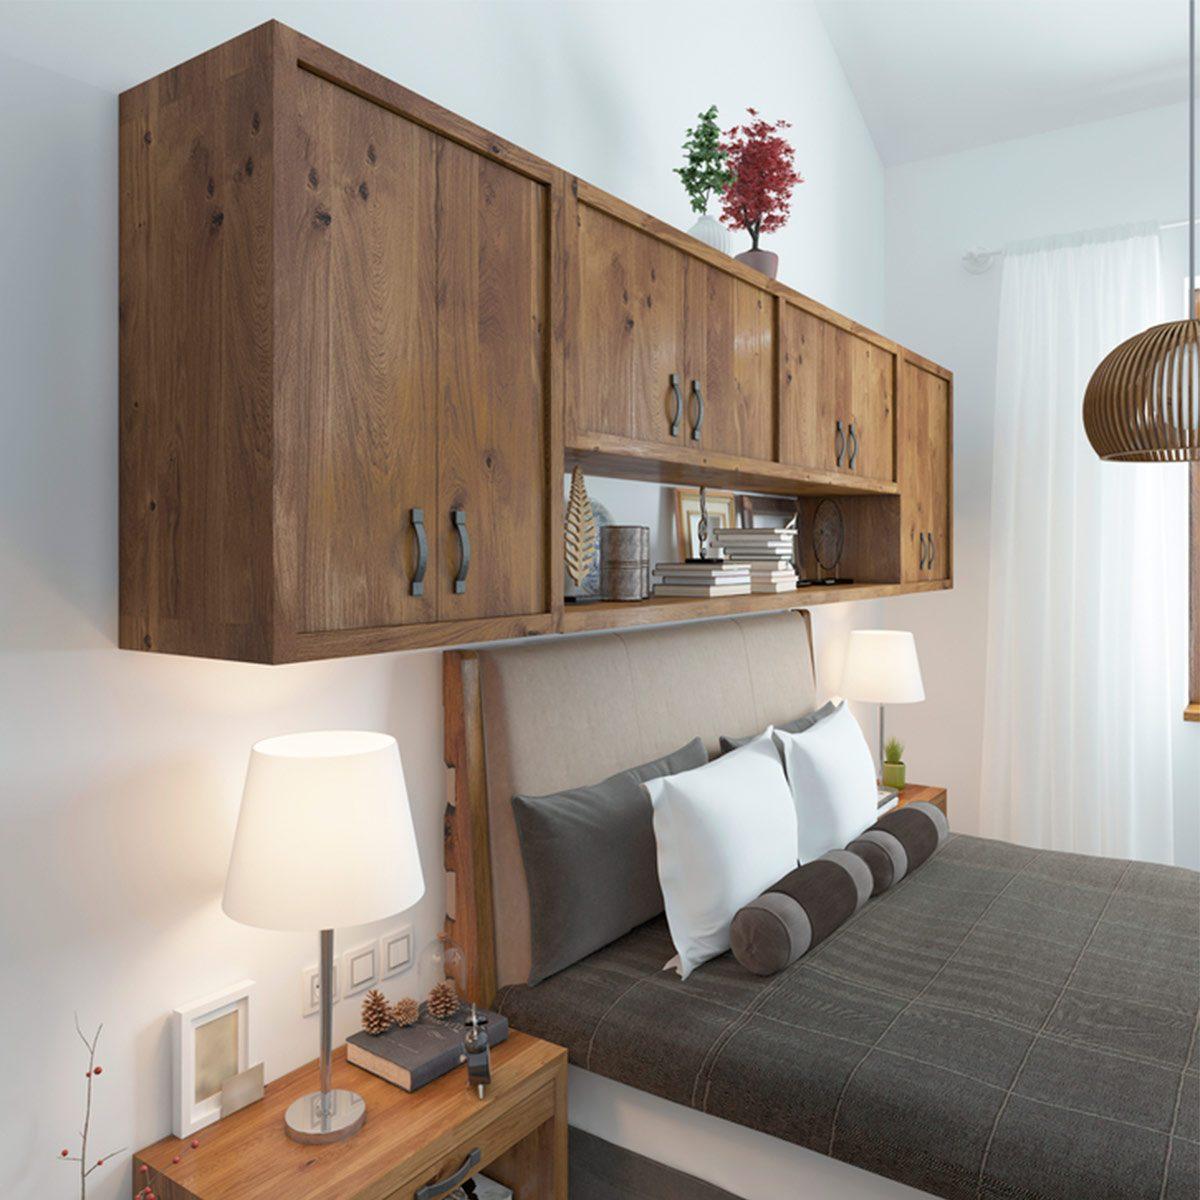 DIY headboard: Hidden Storage